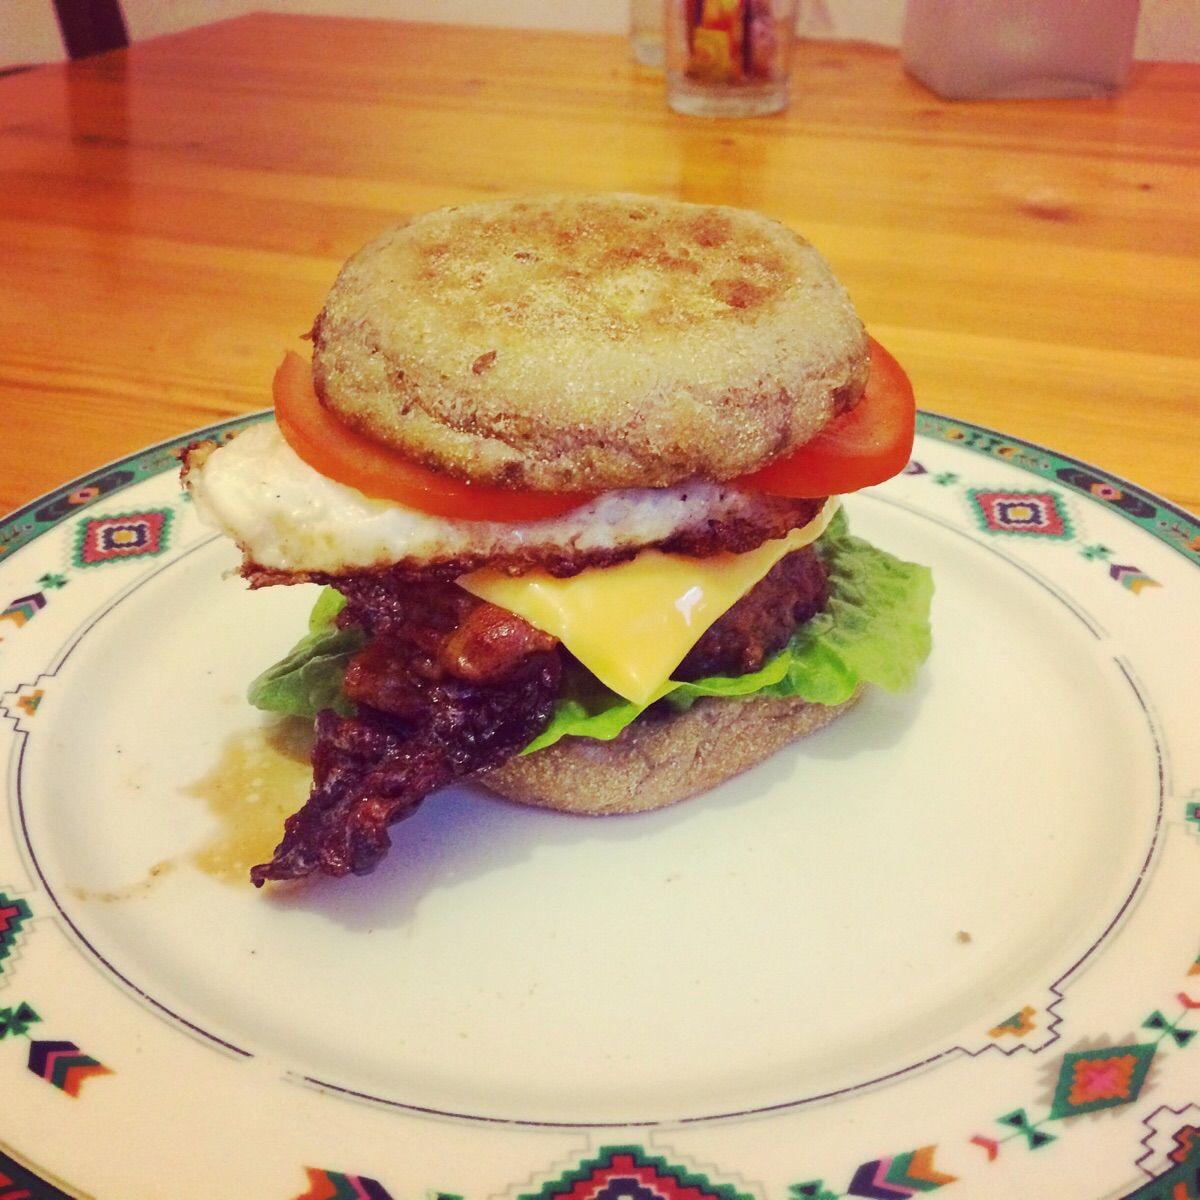 [Homemade] Quarter pounder with bacon and egg http://ift.tt/2krOFui #TimBeta